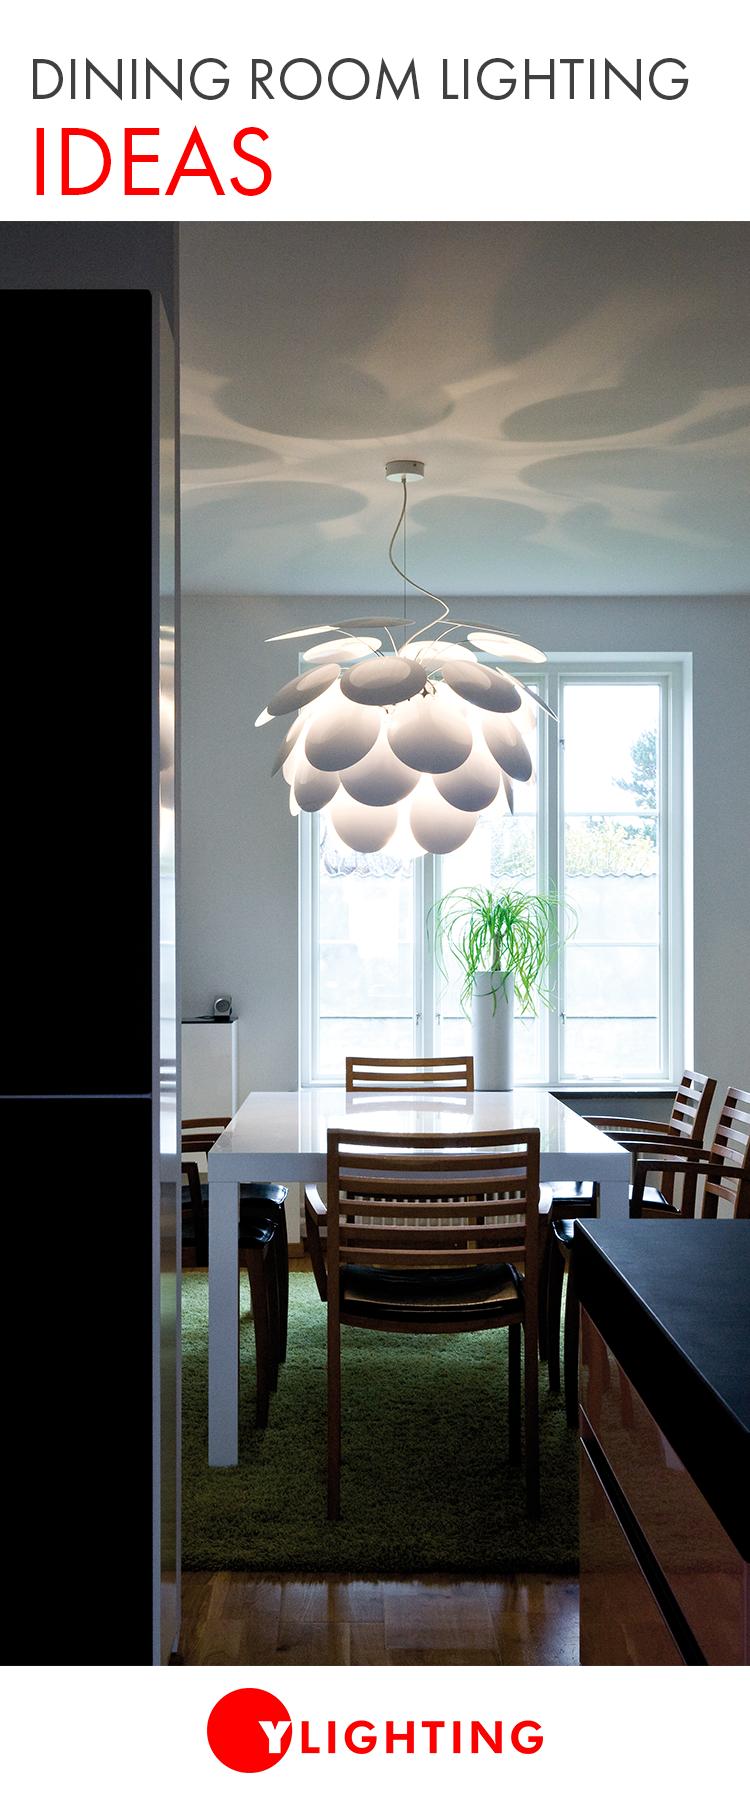 Dining Room Ceiling Lighting Ideas Dining Room Ceiling Lights